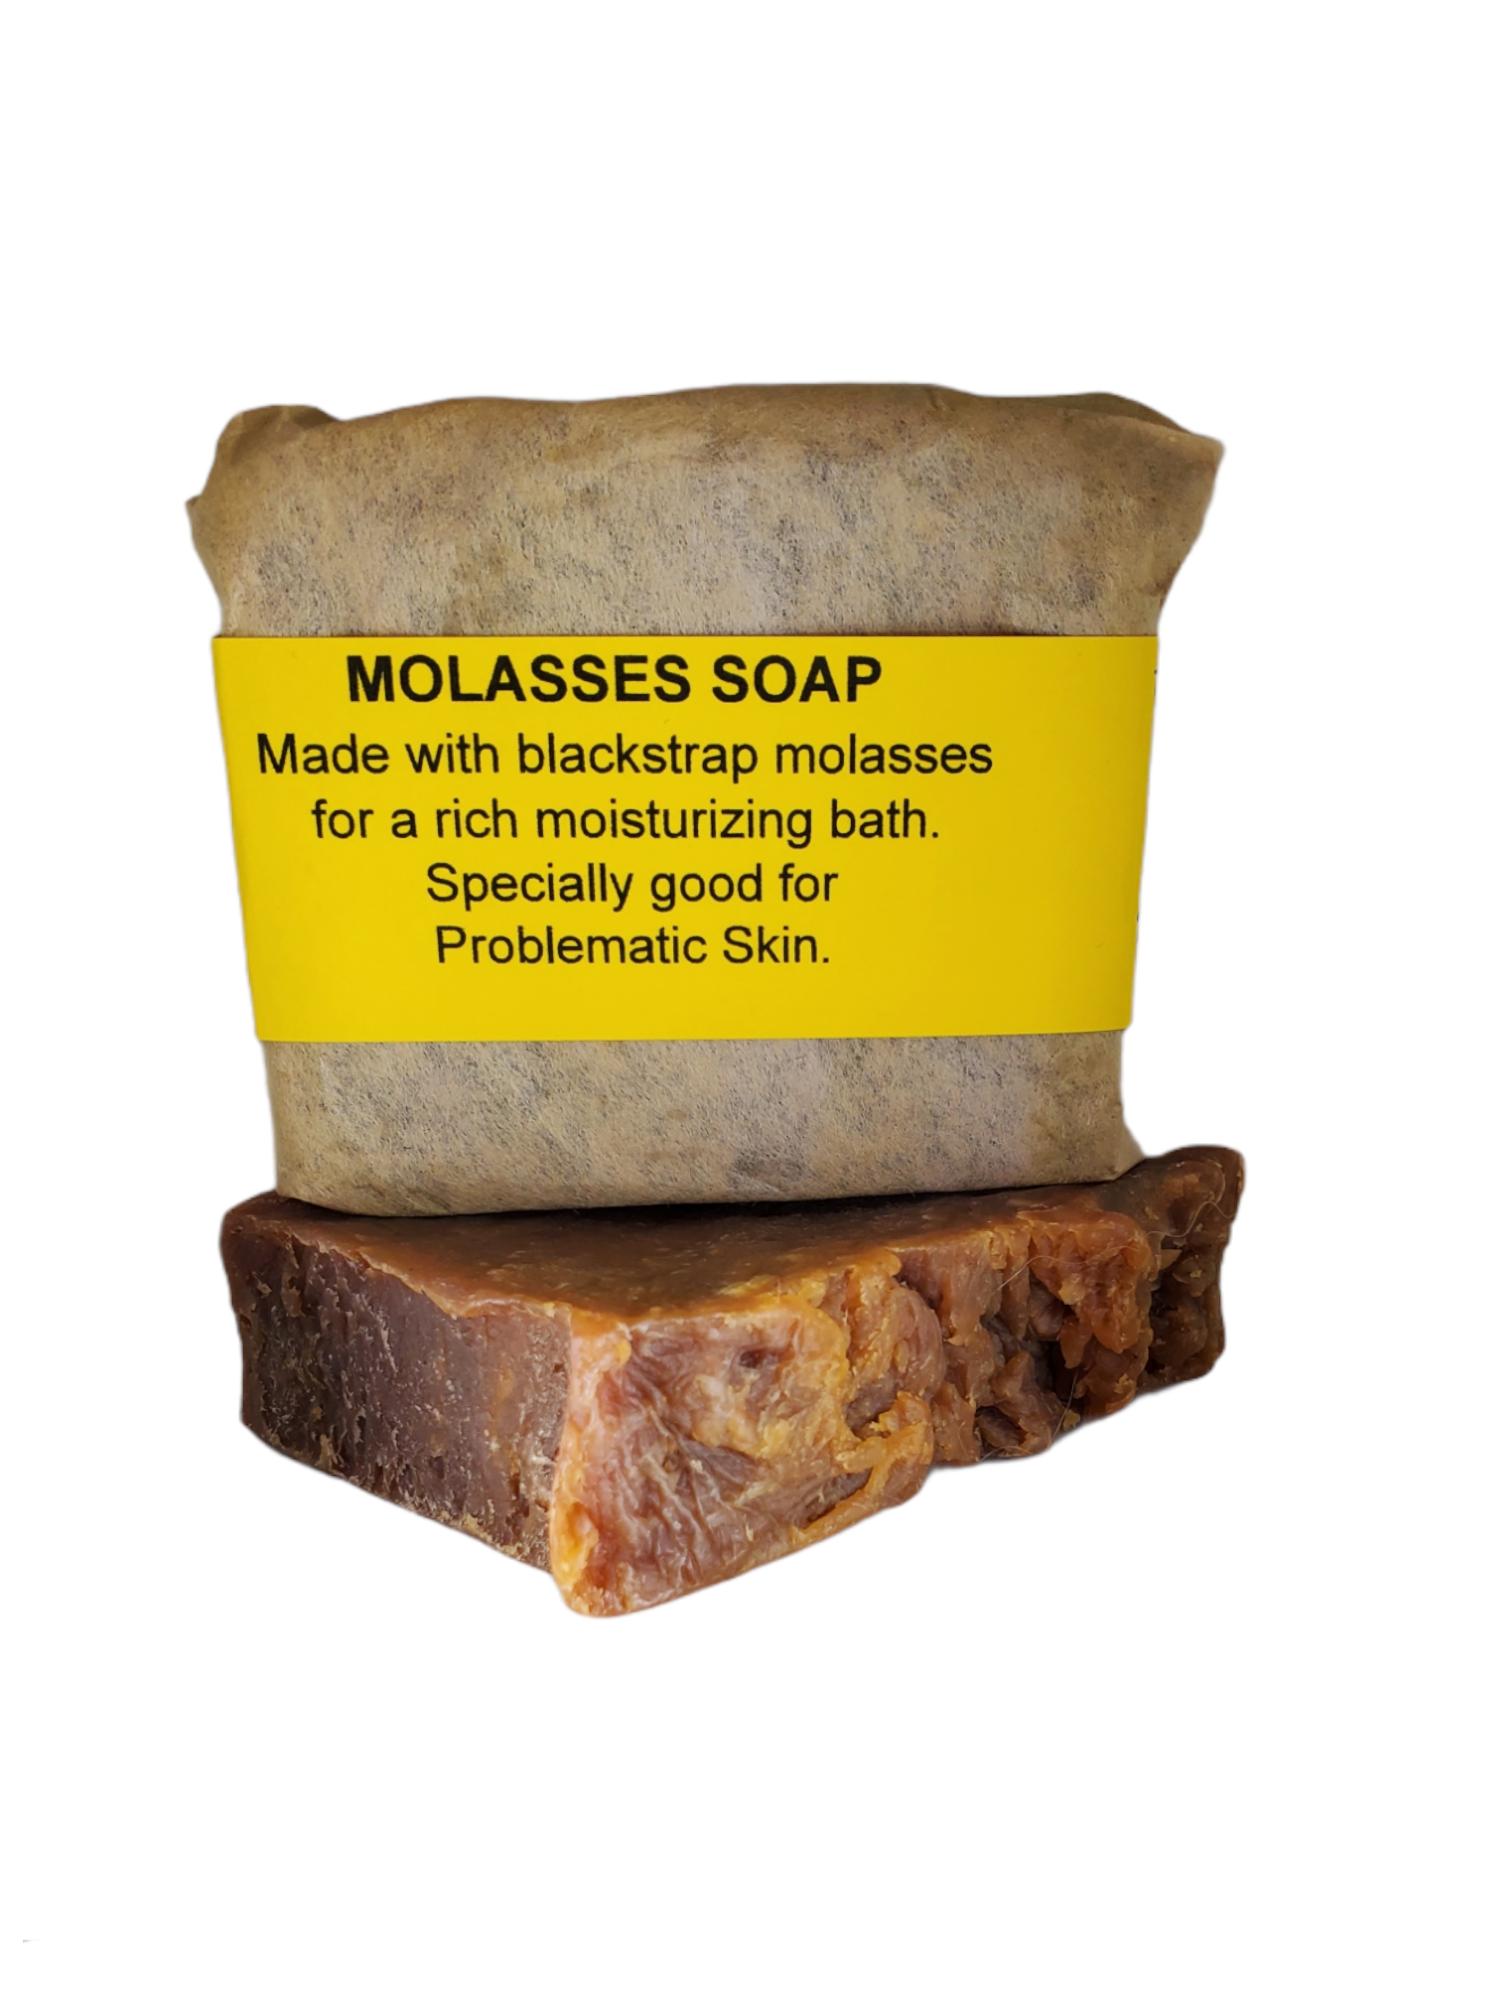 Molasses Soap